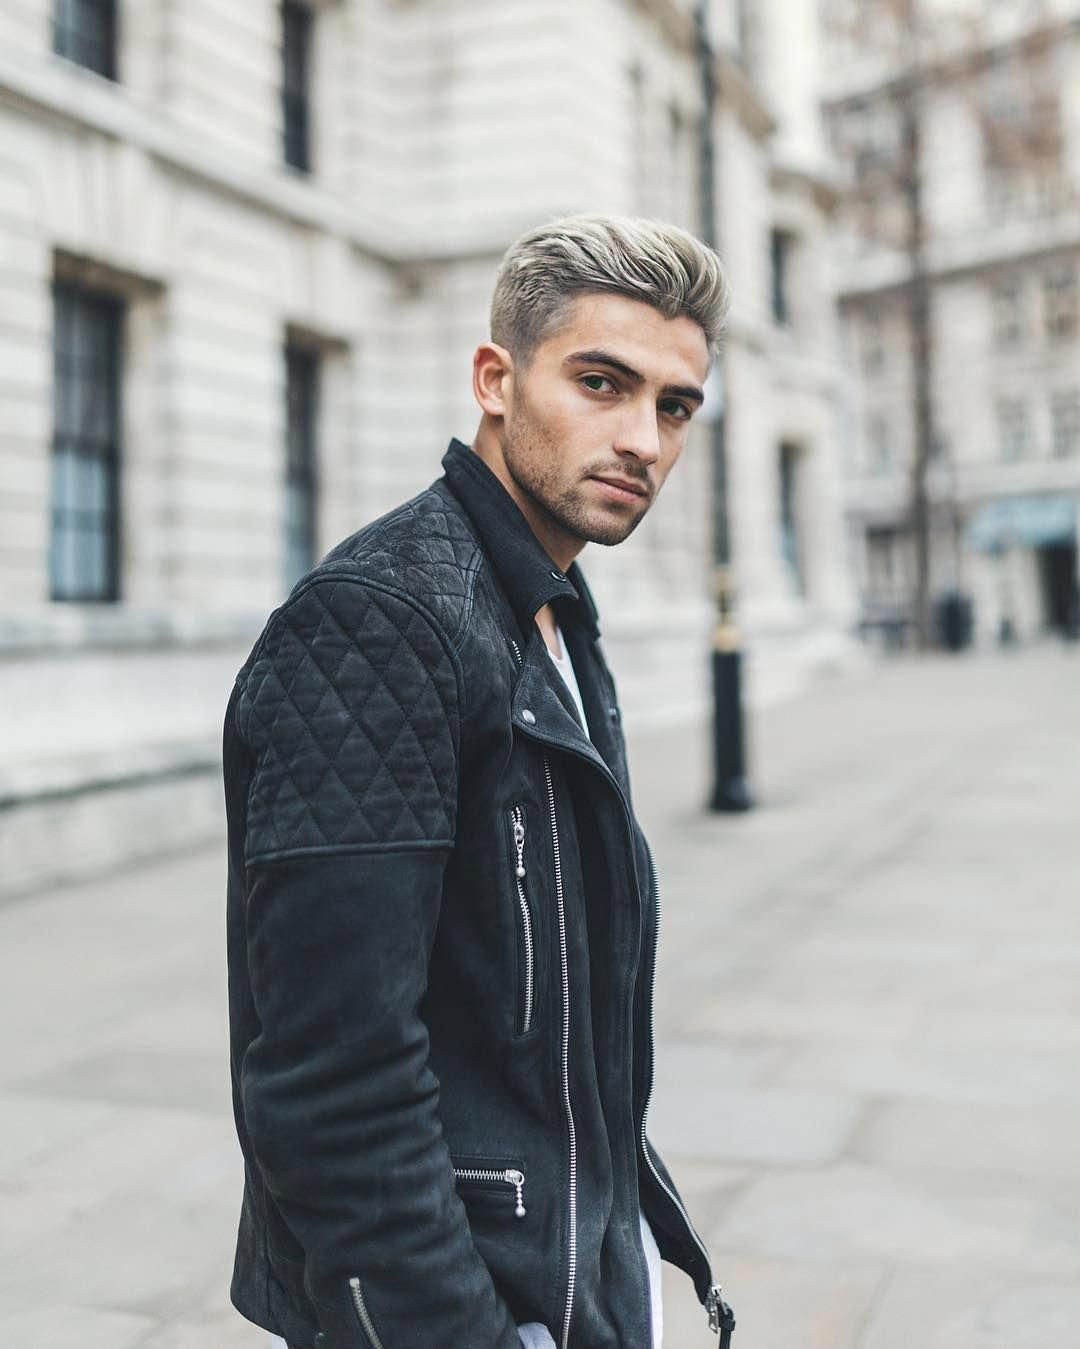 Leatherjacketsformengrey Joey London Leather Jacket Men